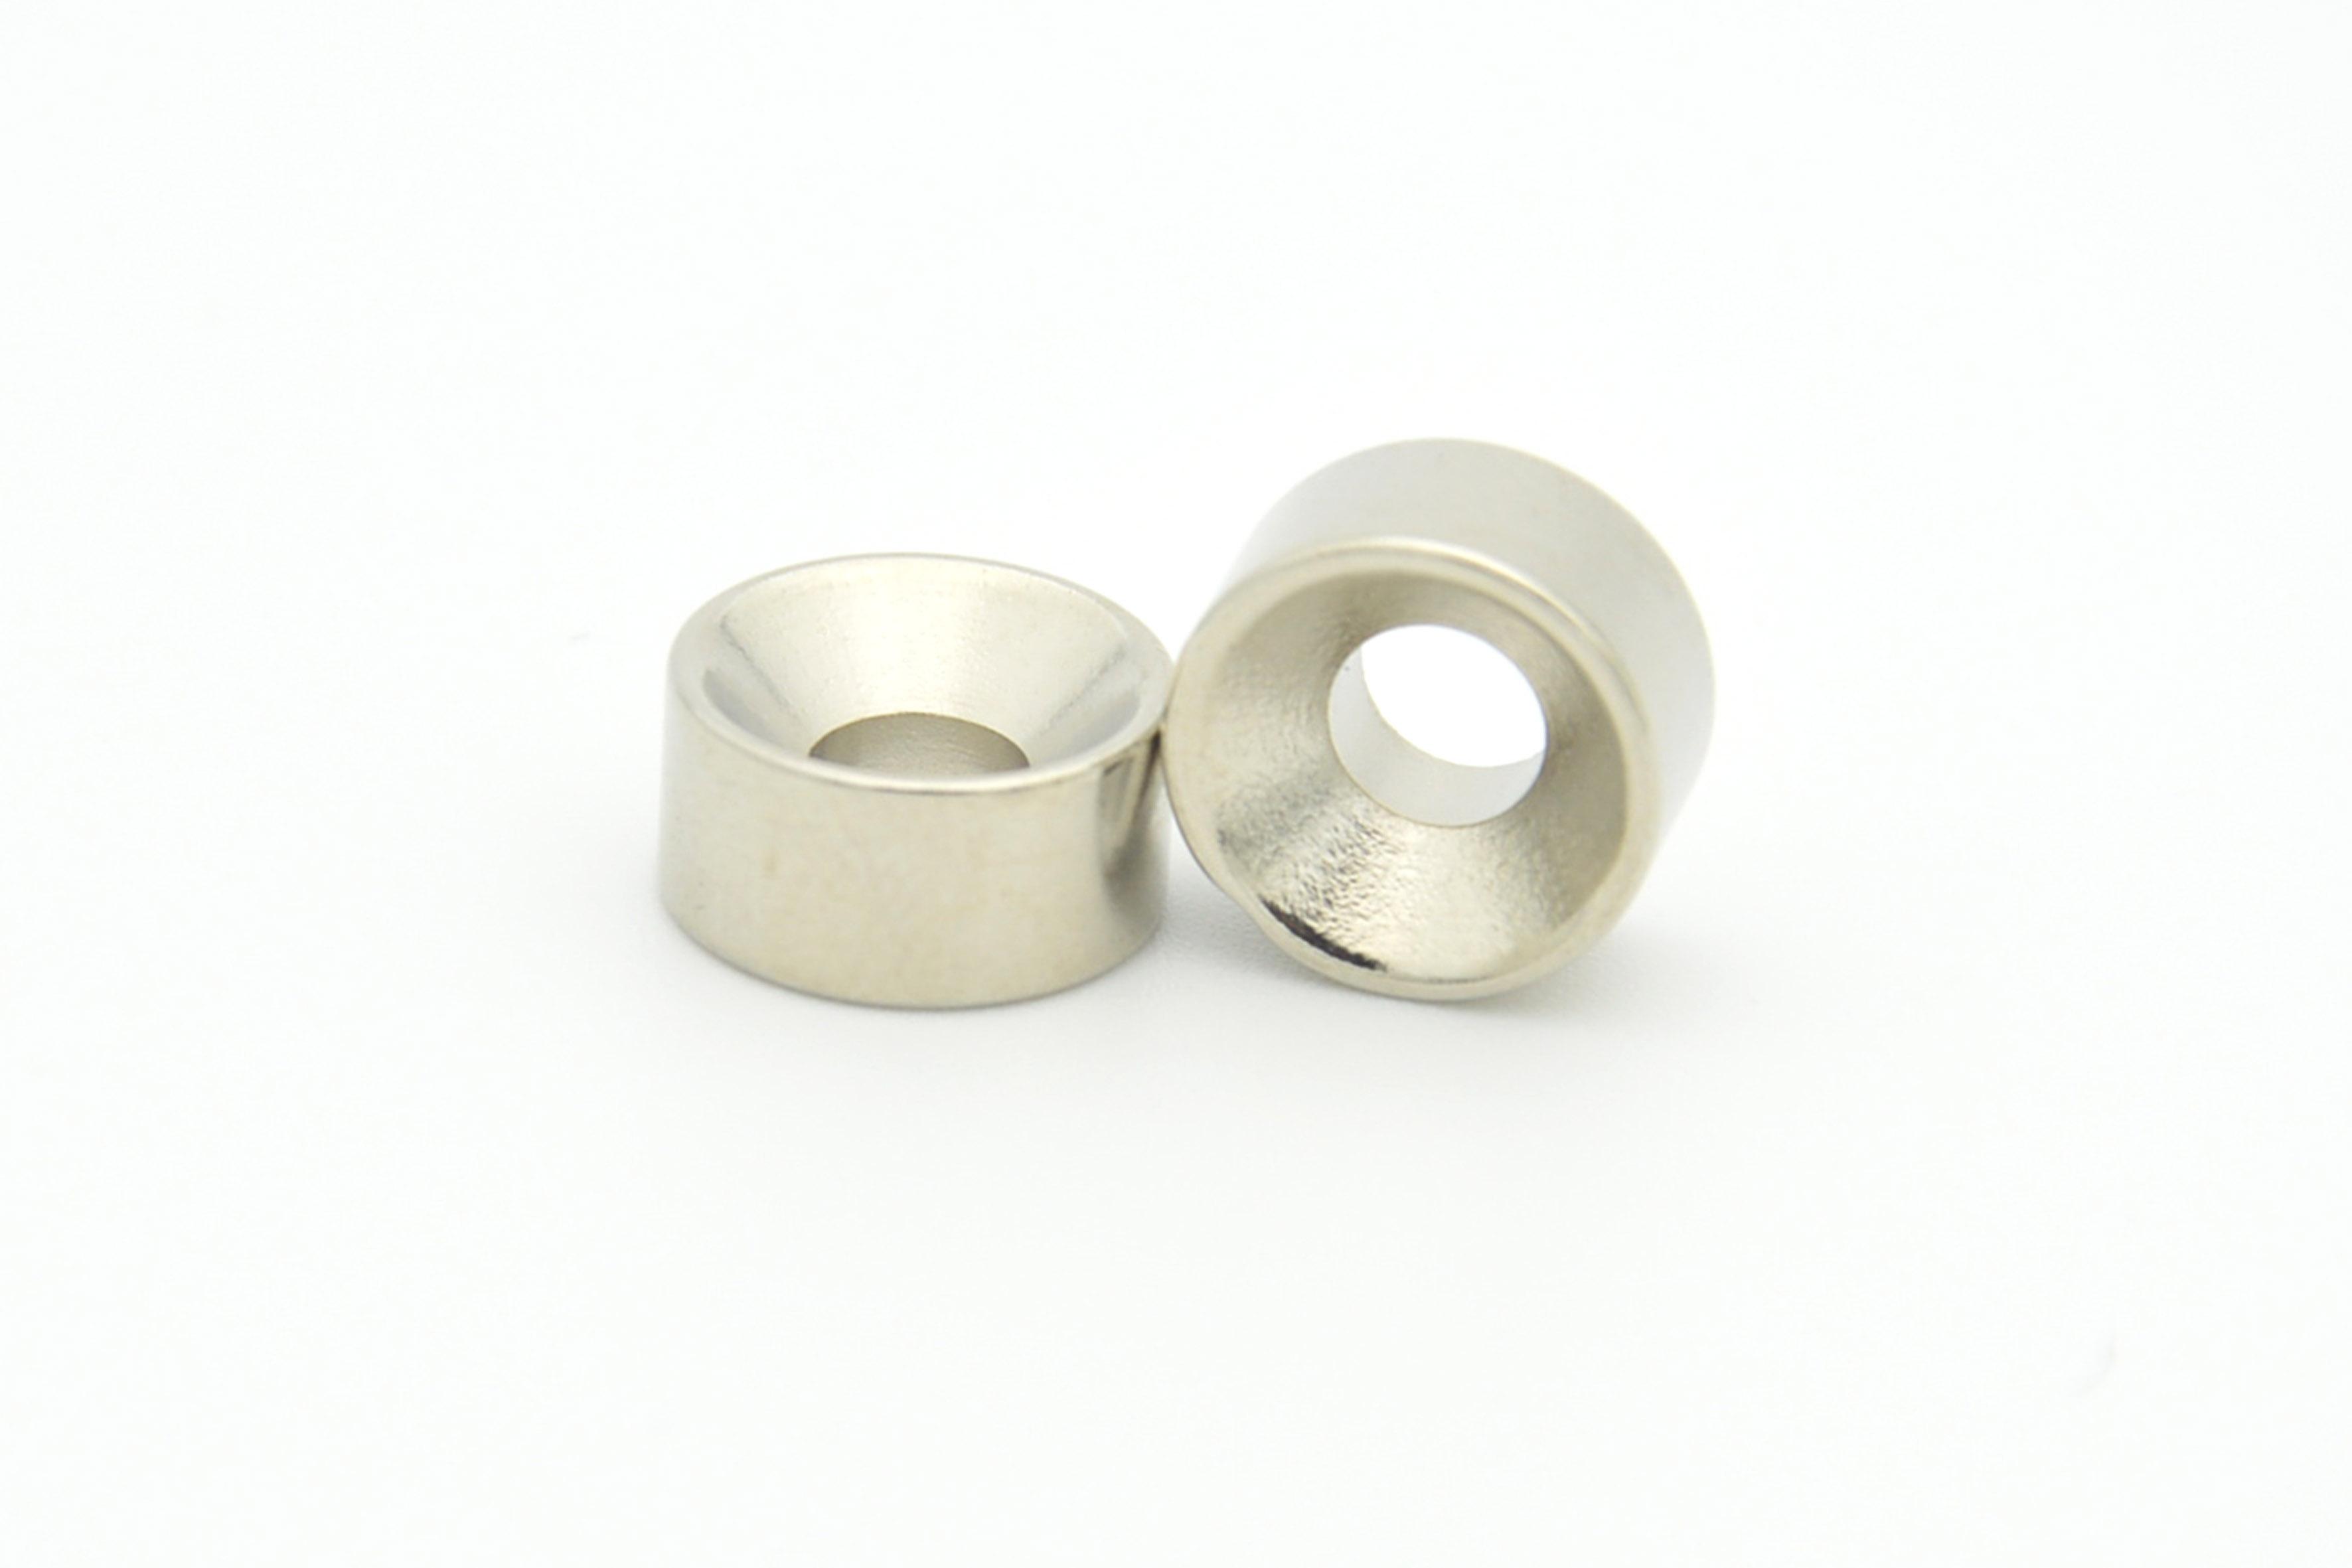 Countersunk neodymium NdFeB magnets with Nickel coating